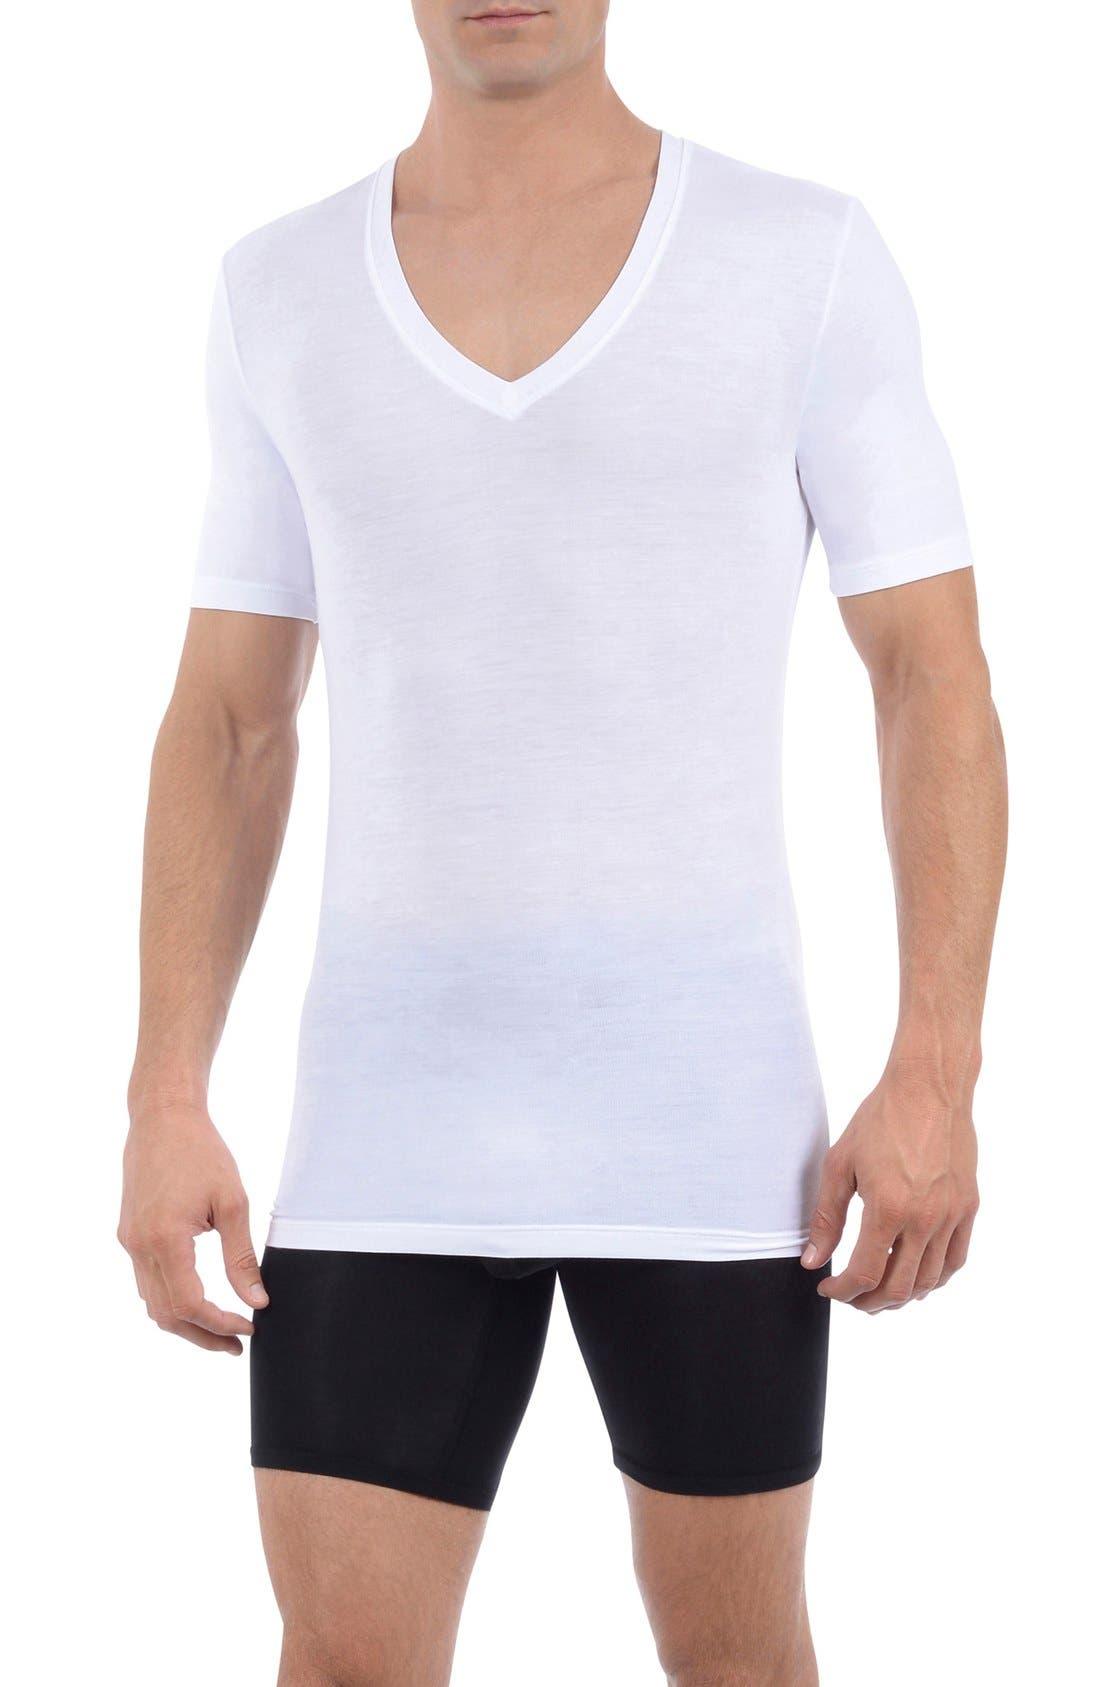 Discount Low Shipping Tommy John Cotton Blend V-Neck T-Shirt Big Sale 4naSCc7